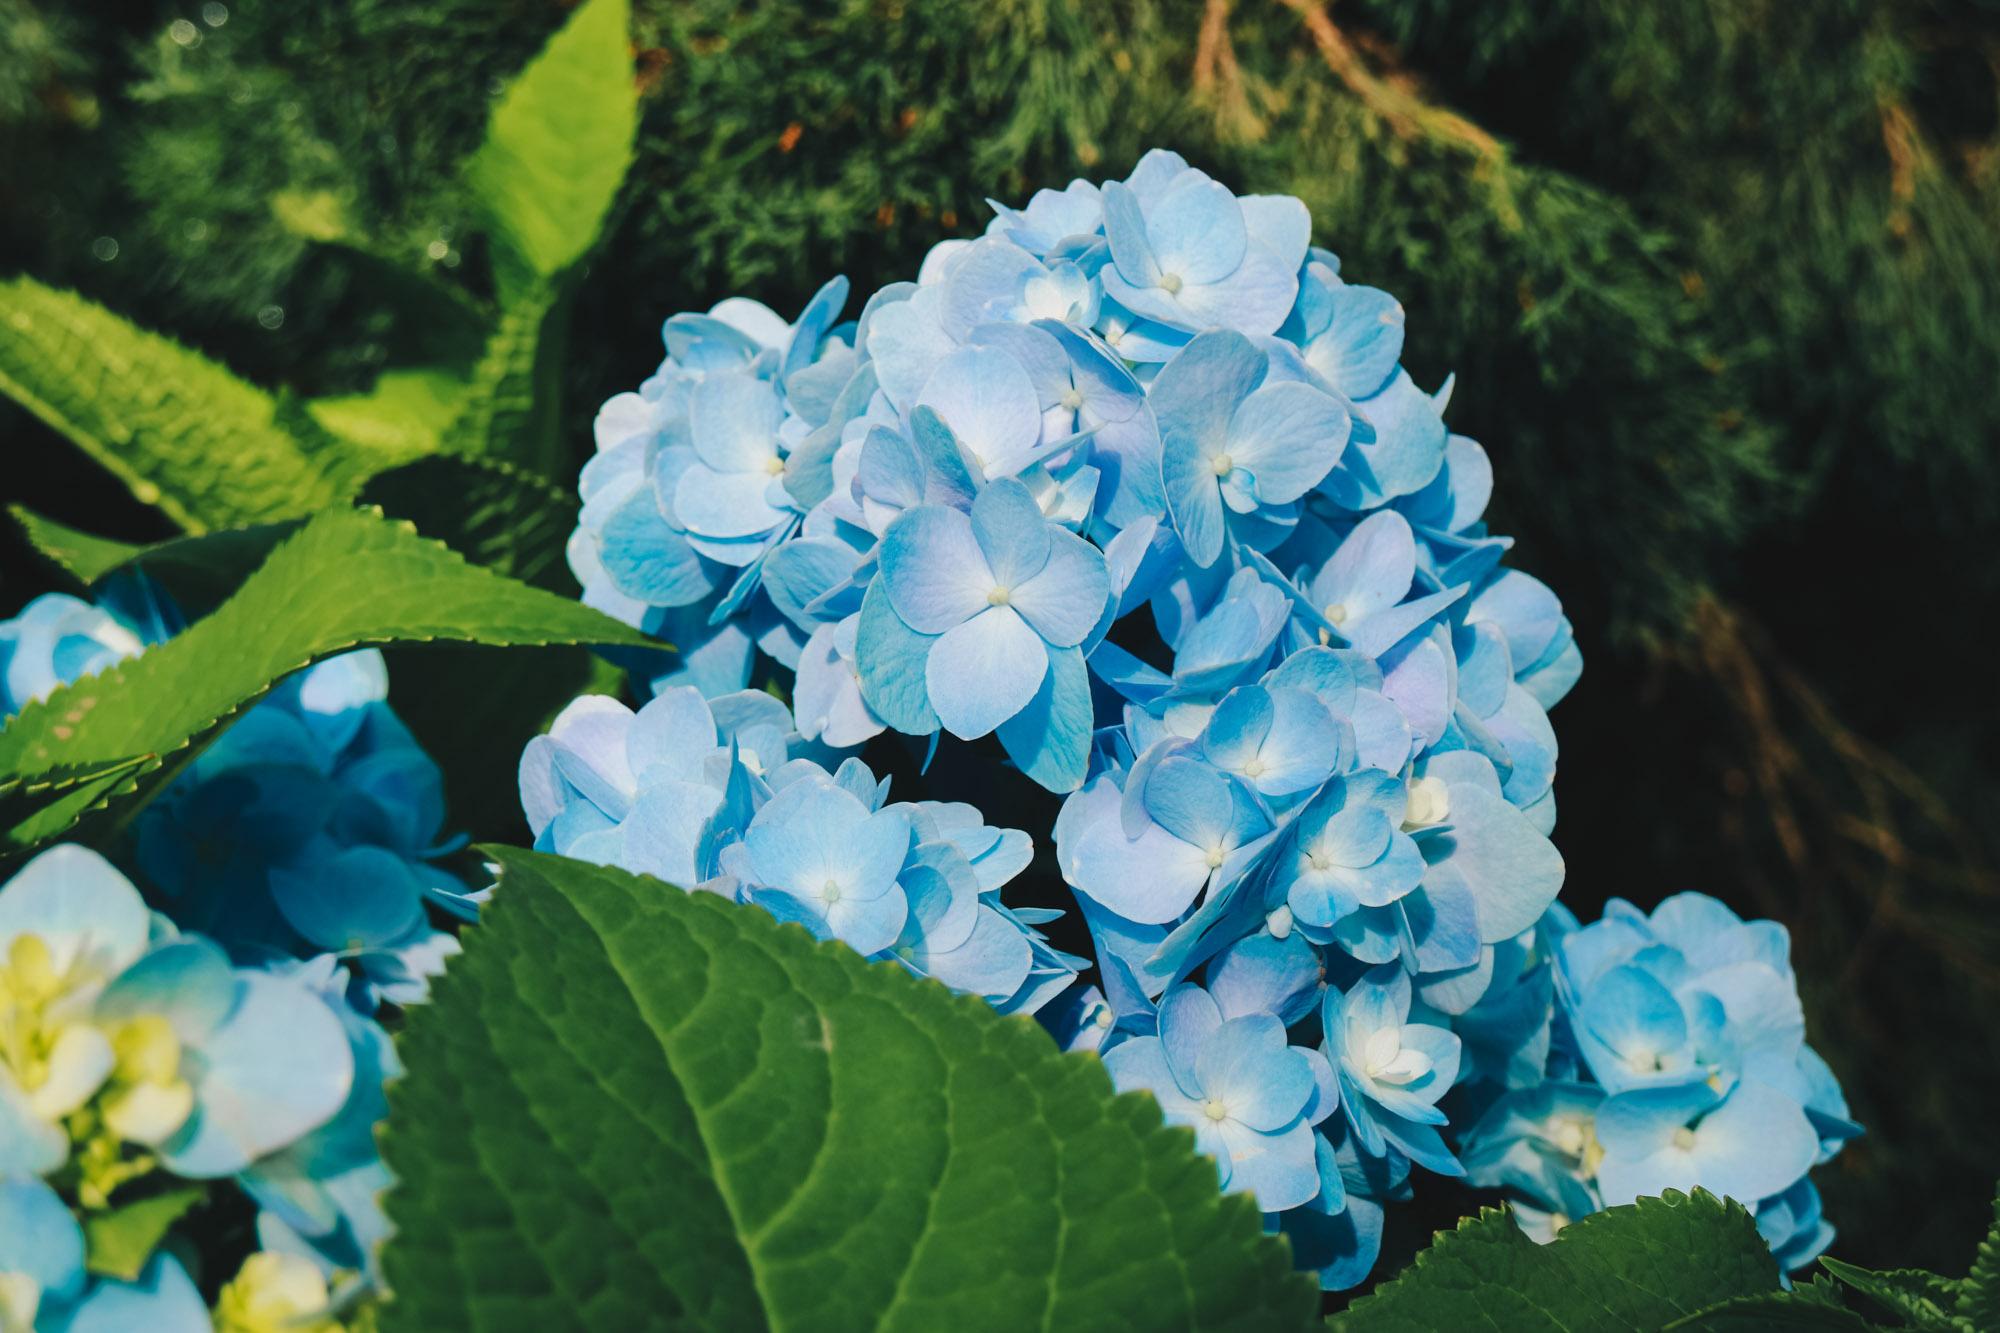 Blue-beauties-floral-display-gardensbythebay-darrenbloggie10